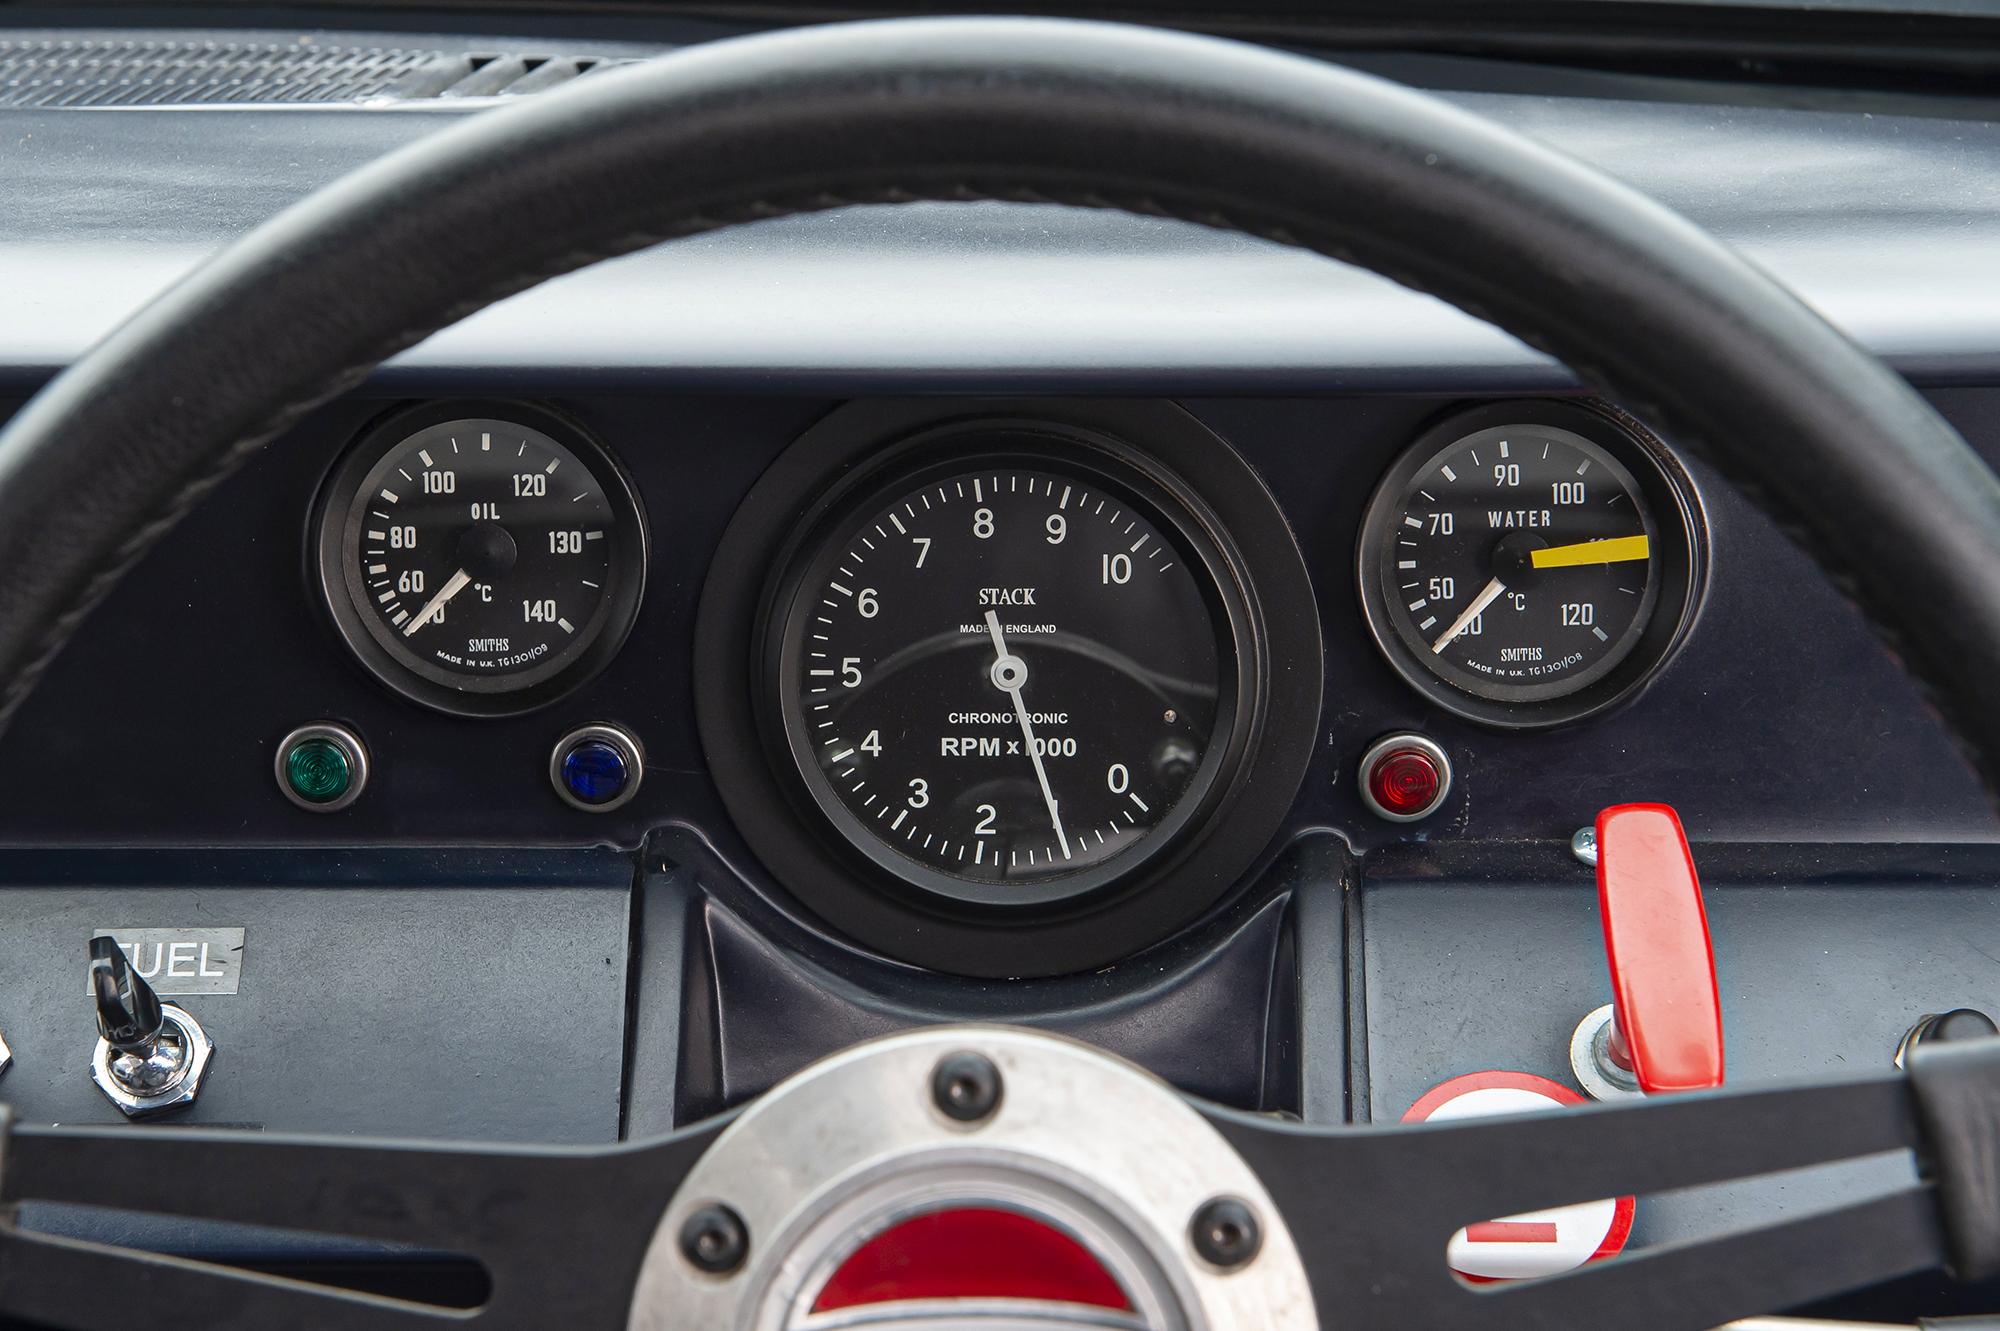 1964 Ford GT40 Prototype GT/105 gauge cluster